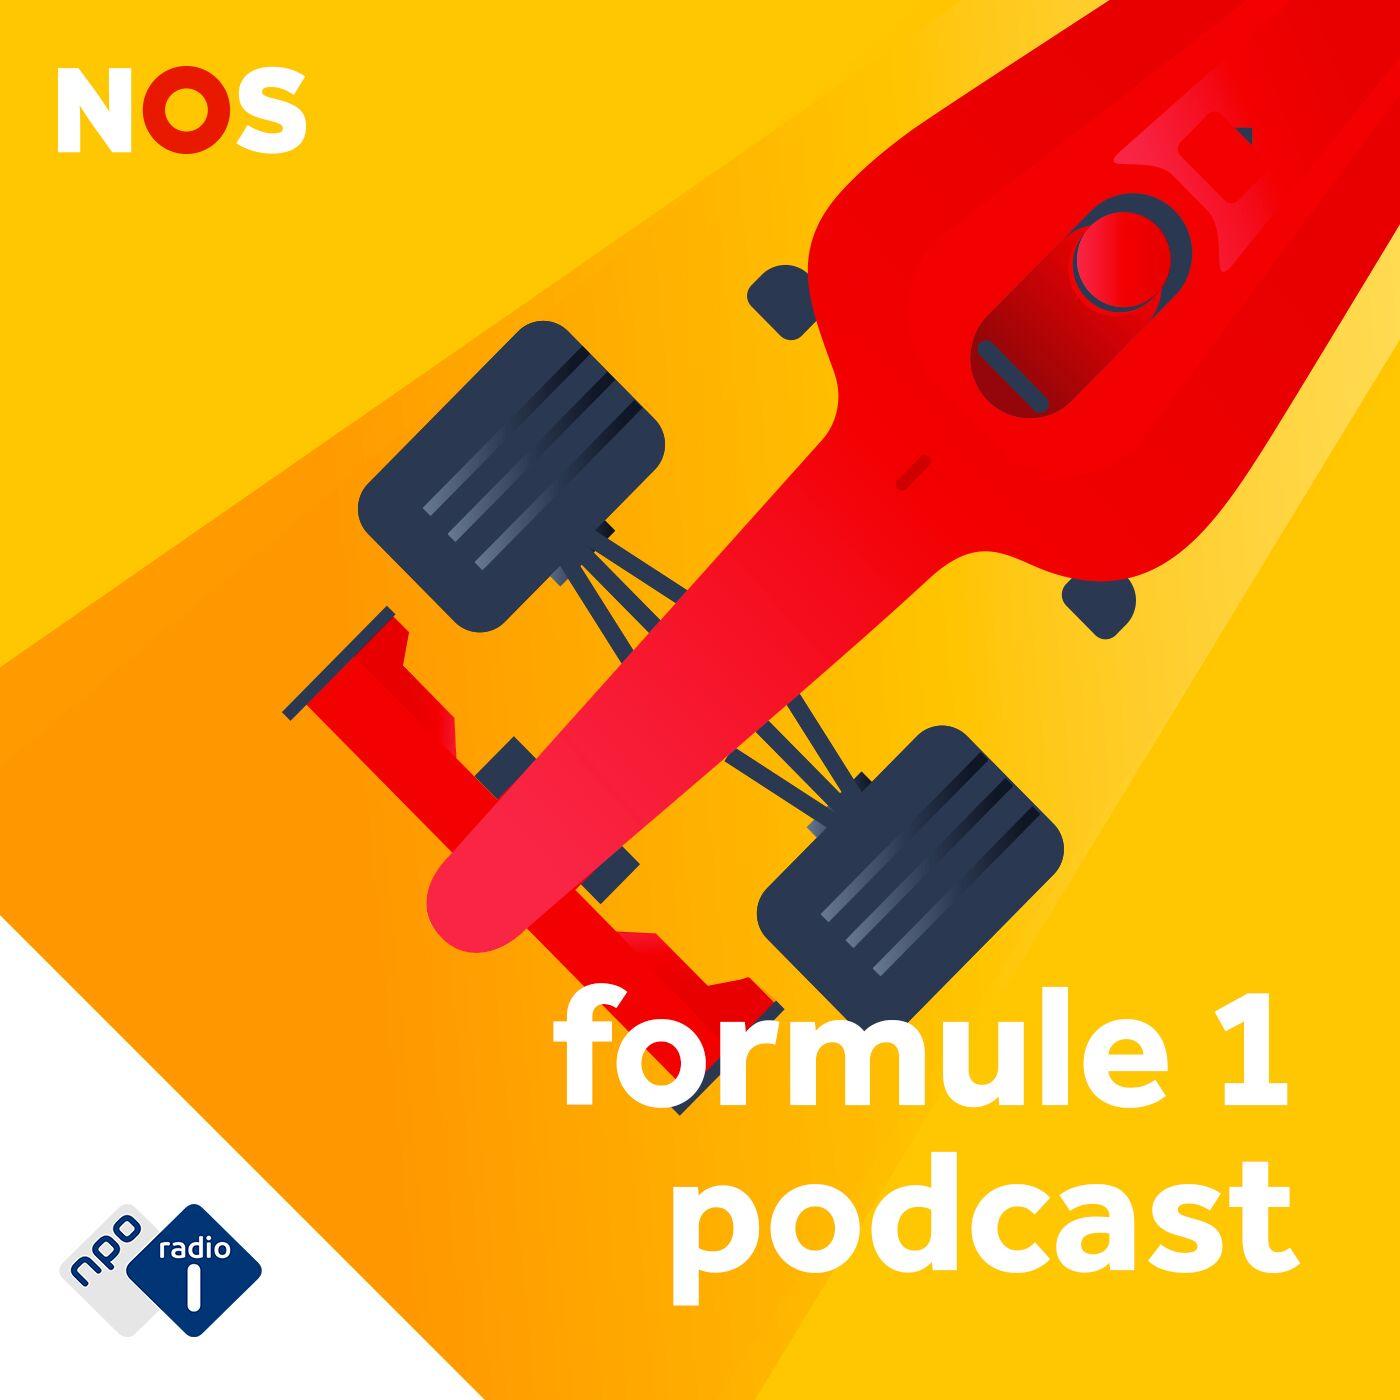 NOS Formule 1-Podcast podcast show image